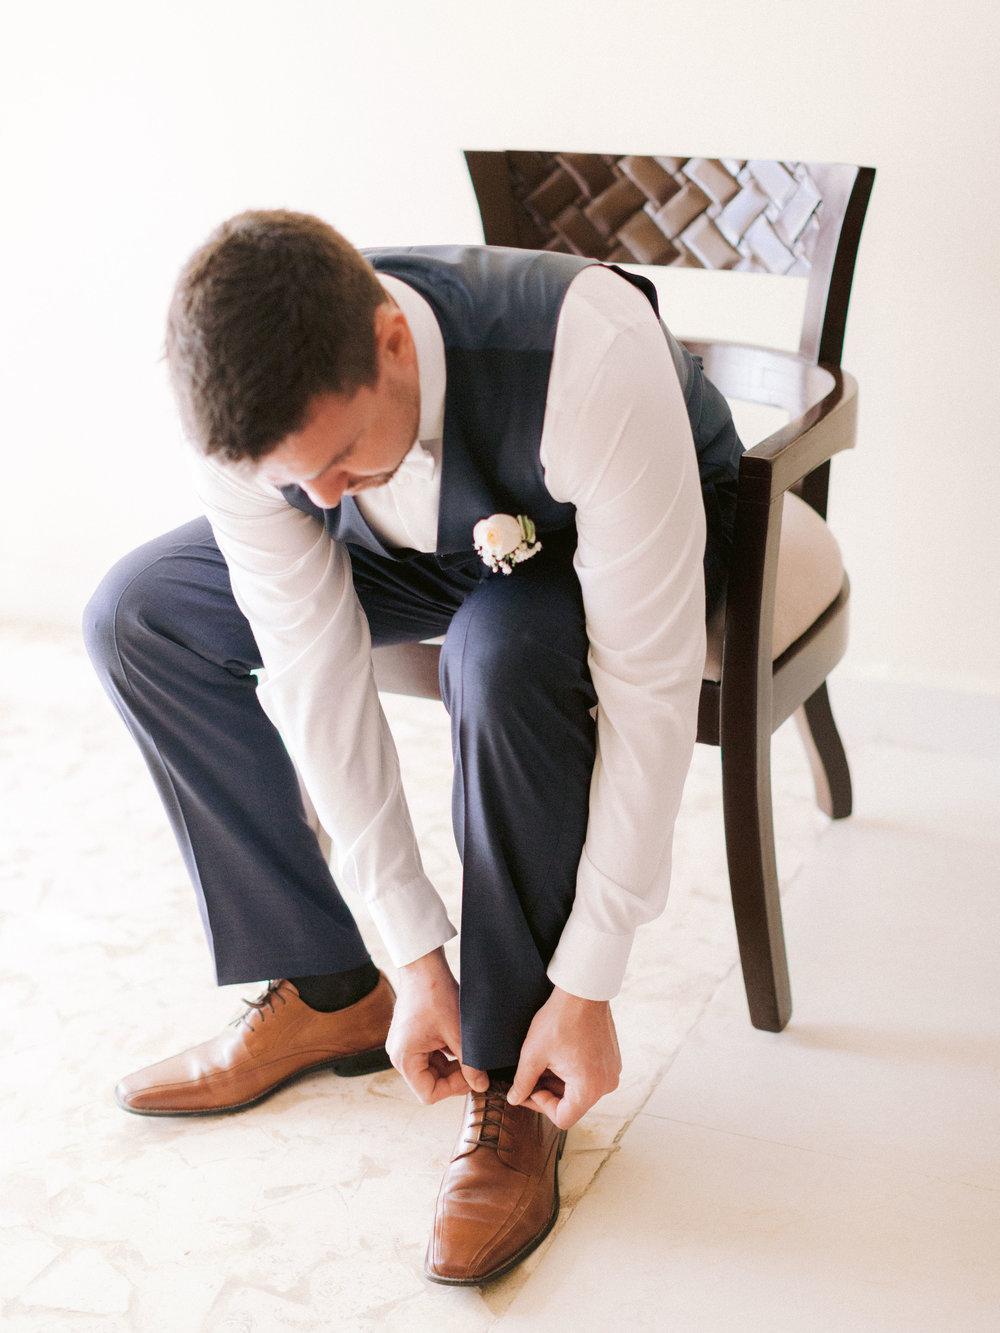 Kim_Jeff_Cancun Wedding_Getting_Ready_Kurtz_Orpia (93 of 105).jpg